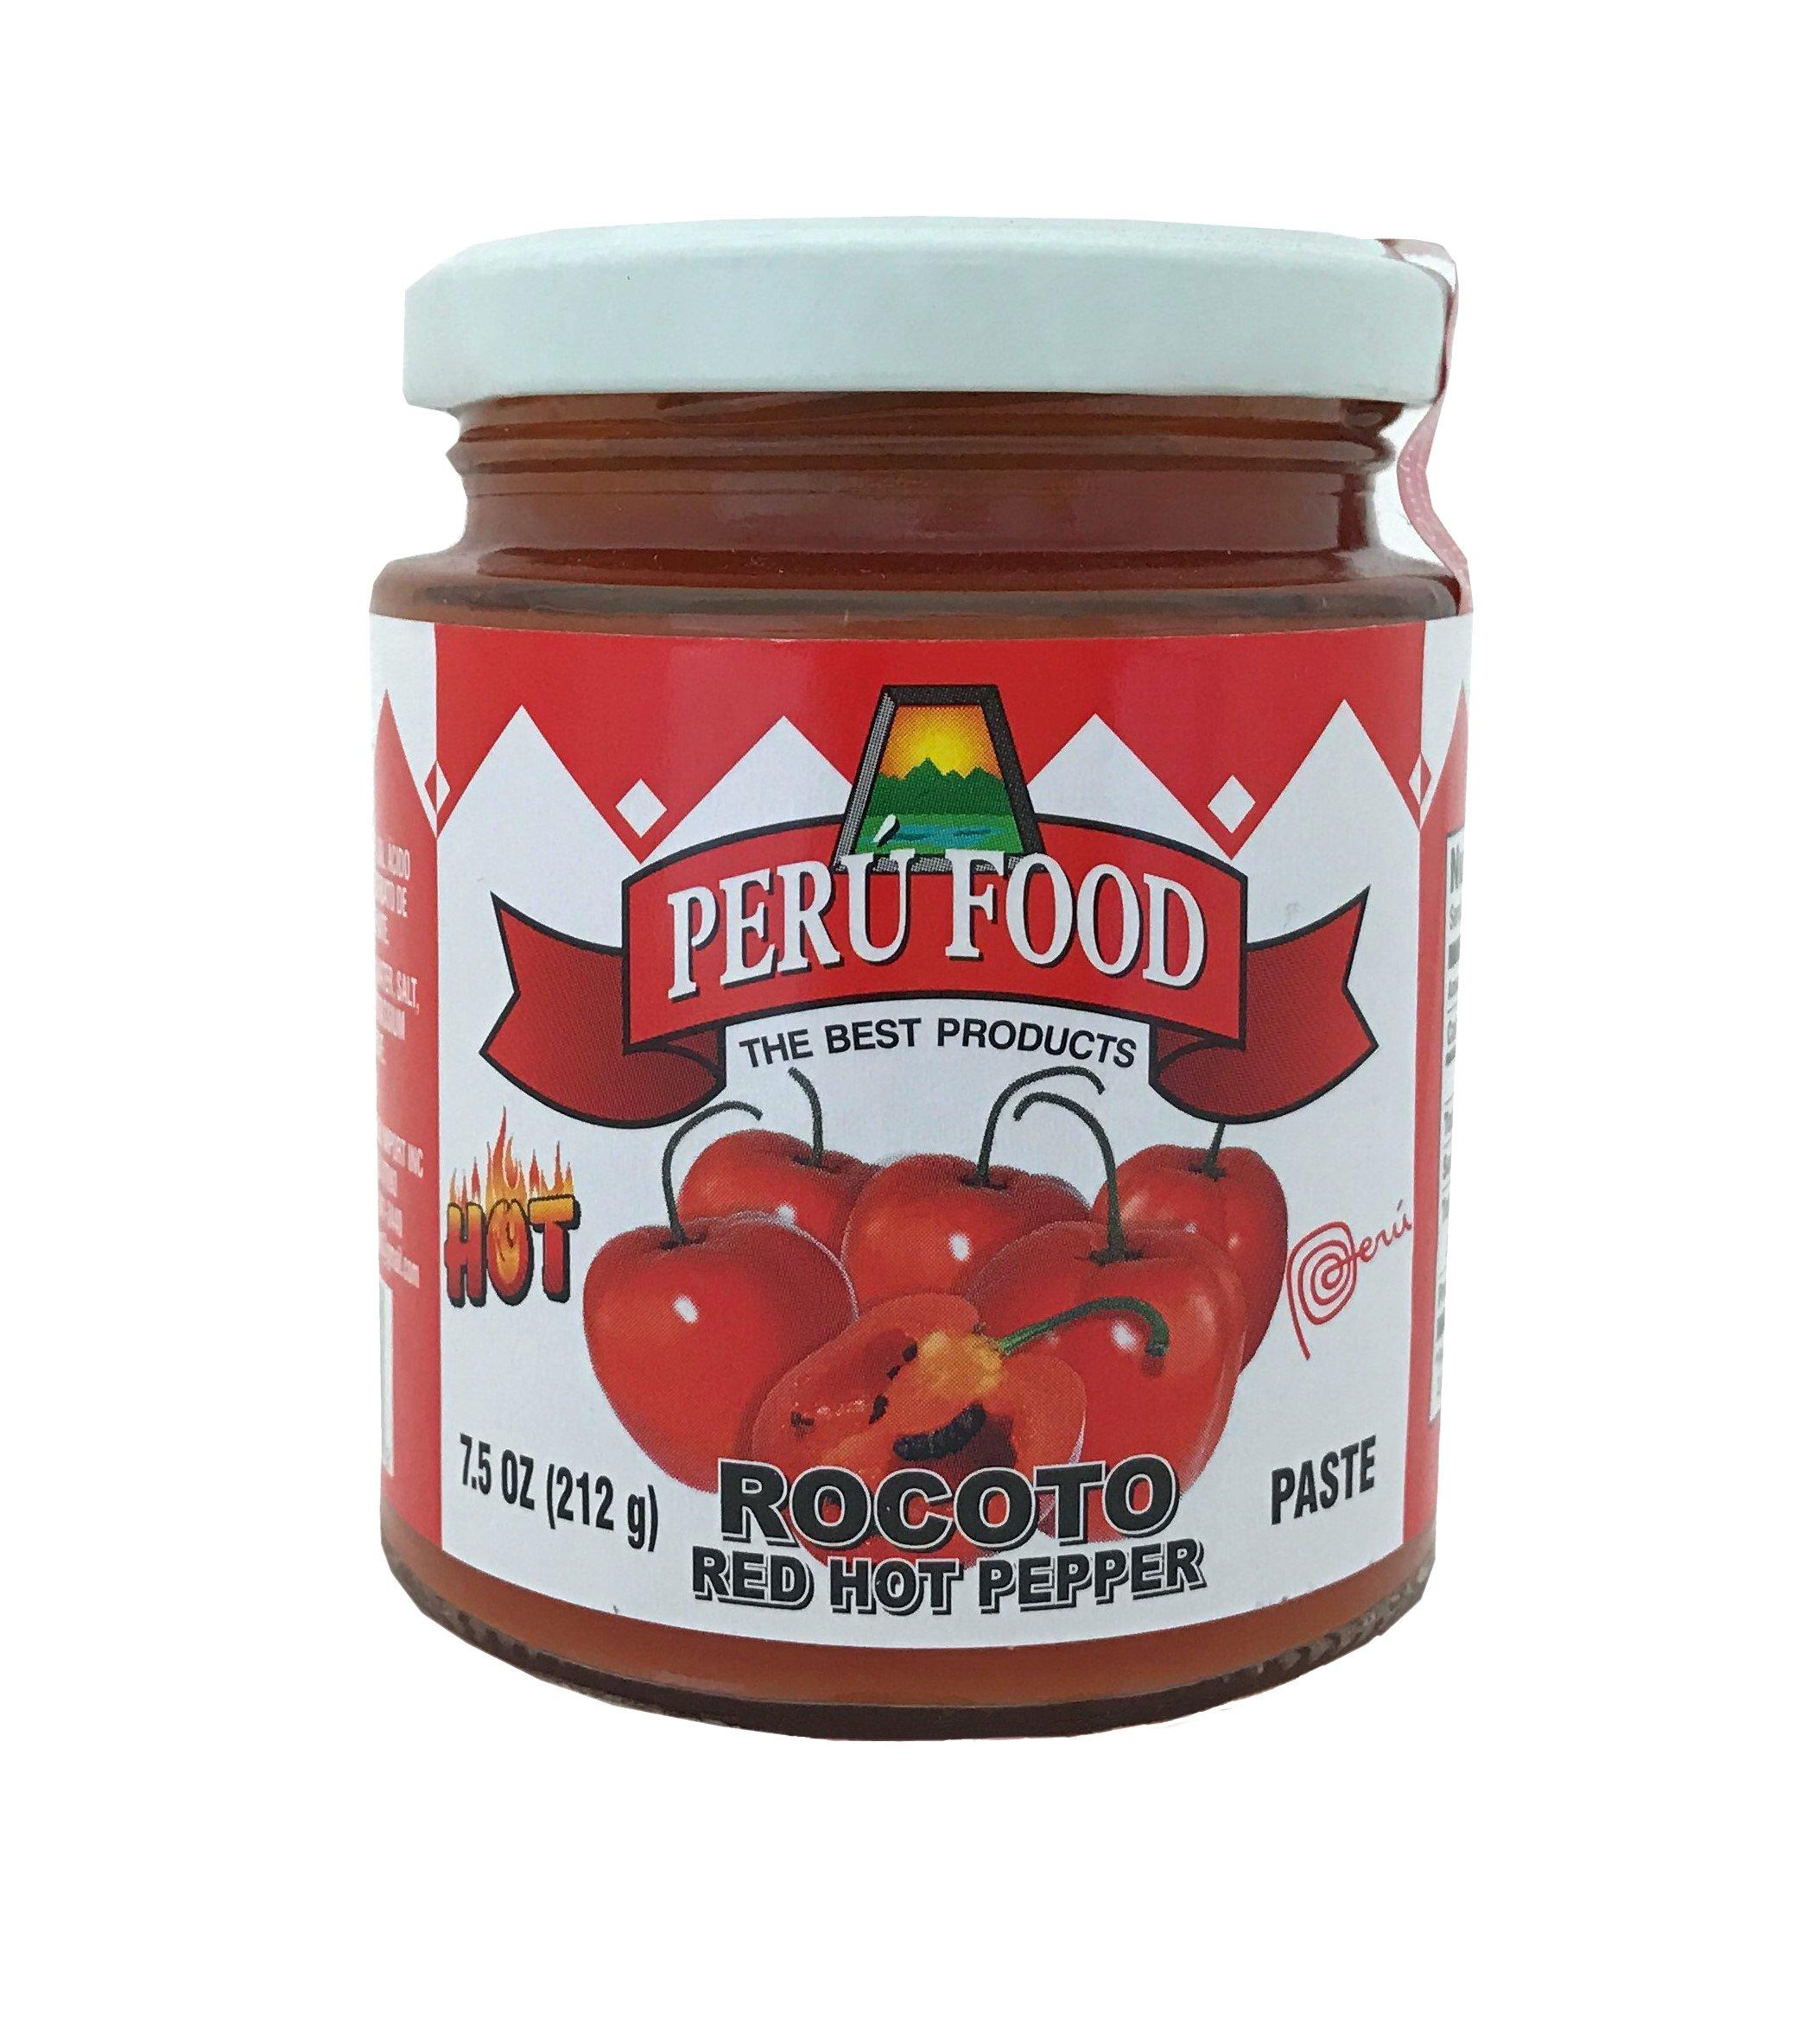 Peru Food - Rocoto (Red peppers) 7.5 oz. Product of Peru by PERU FOOD (Image #1)